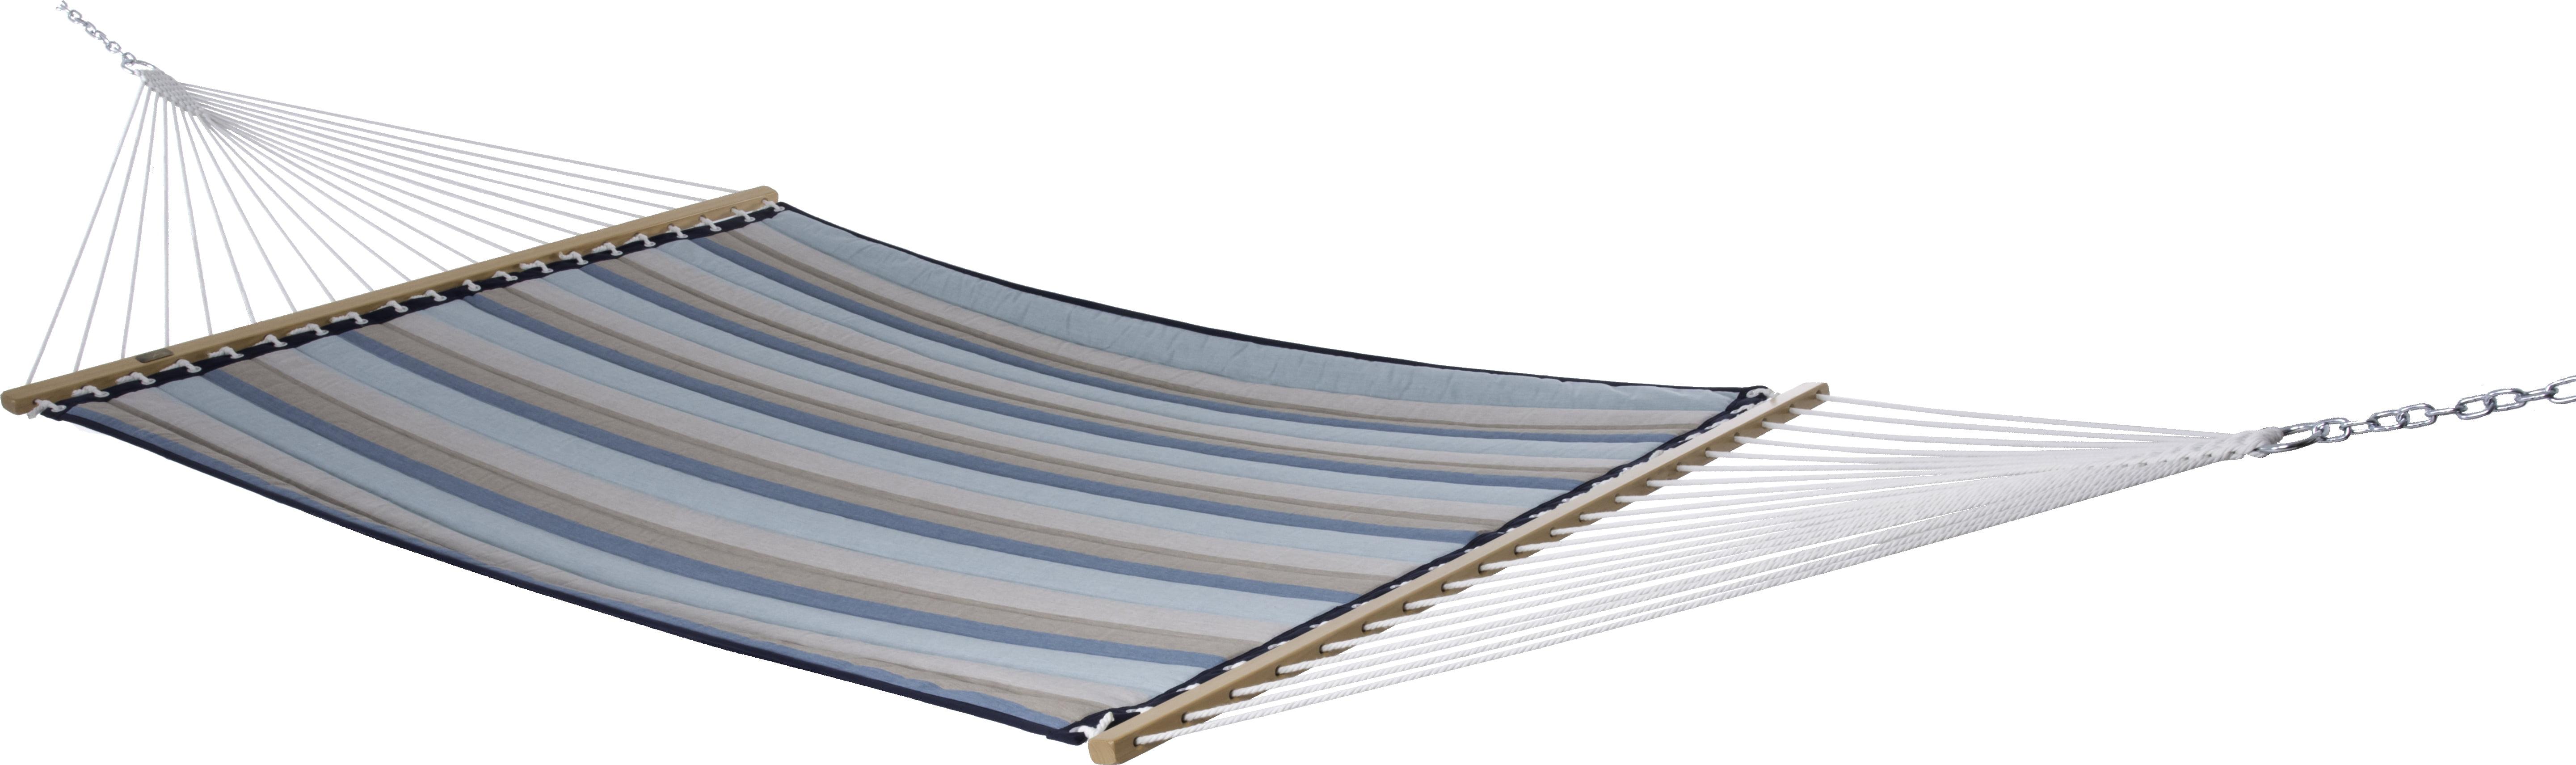 Sunbrella Quilted Hammock Double (Gateway Mist) by Vivere LTD